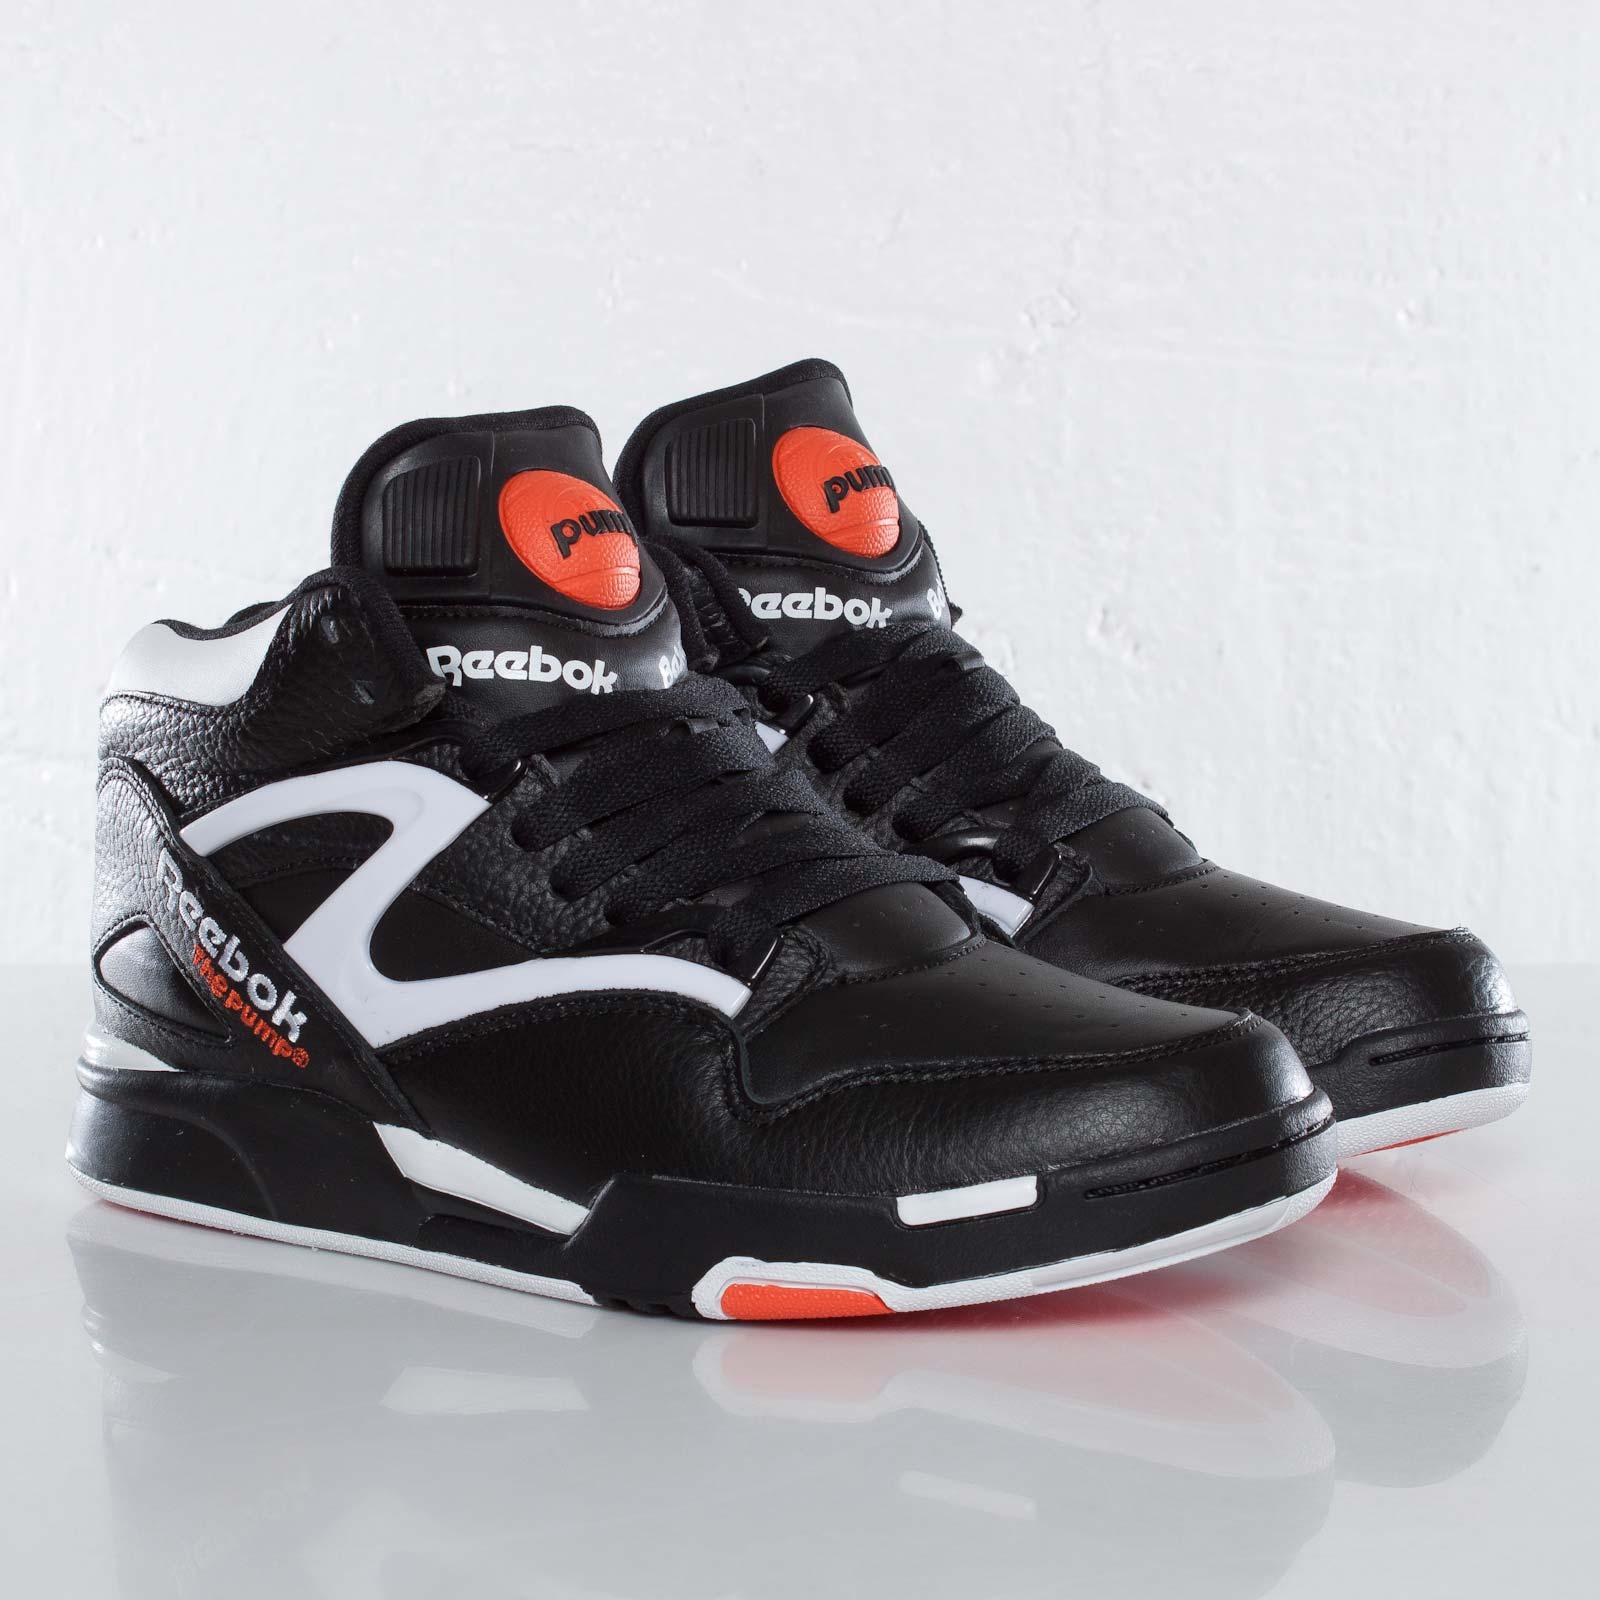 c5de82b3cae5 Reebok Pump Omni Lite - J15298 - Sneakersnstuff